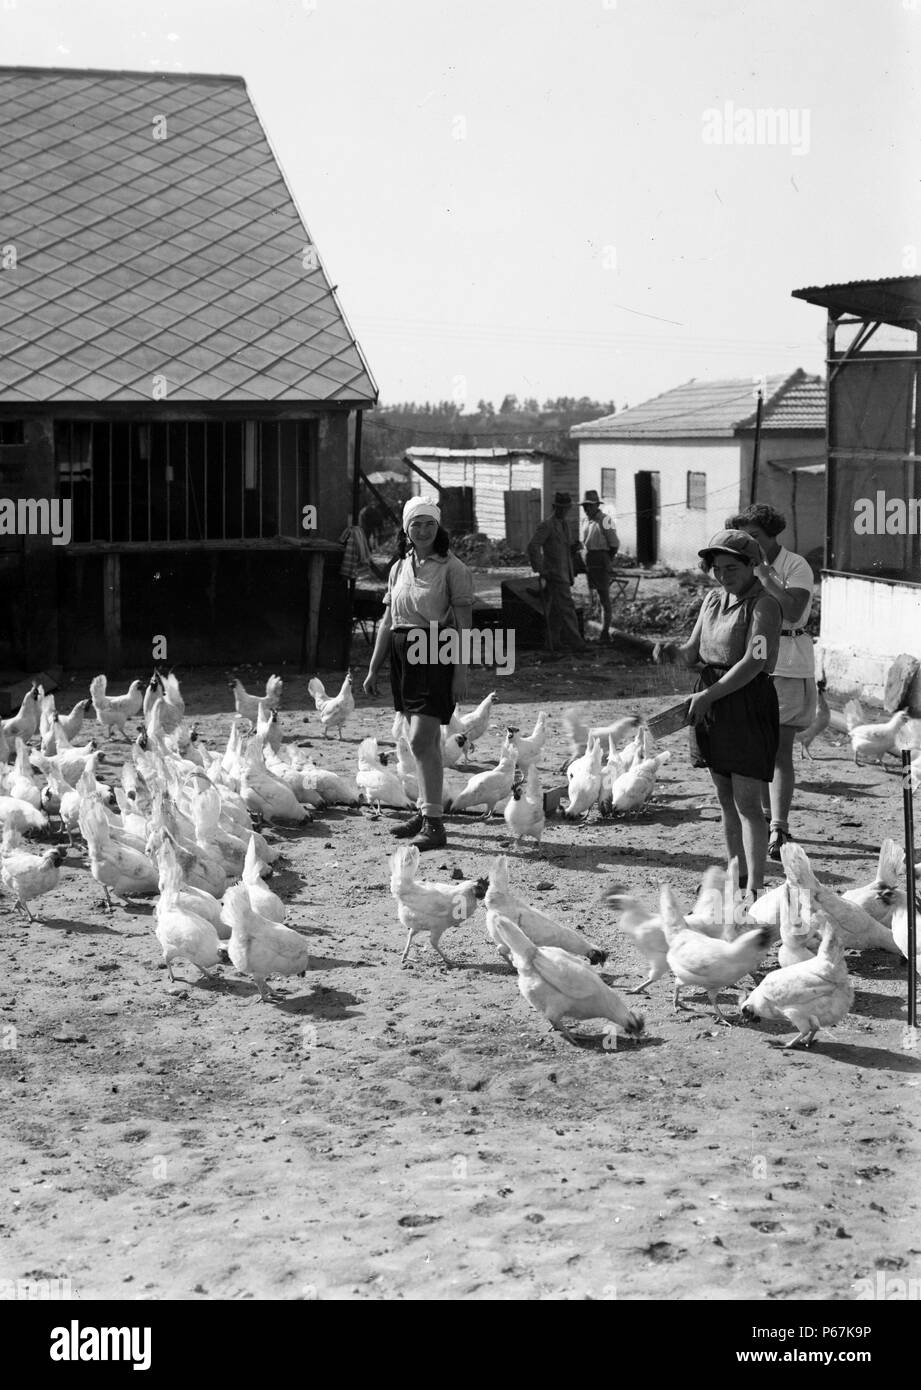 Zionist colonies on Sharon. Borochov, Girls farm, feeding poultry Stock Photo